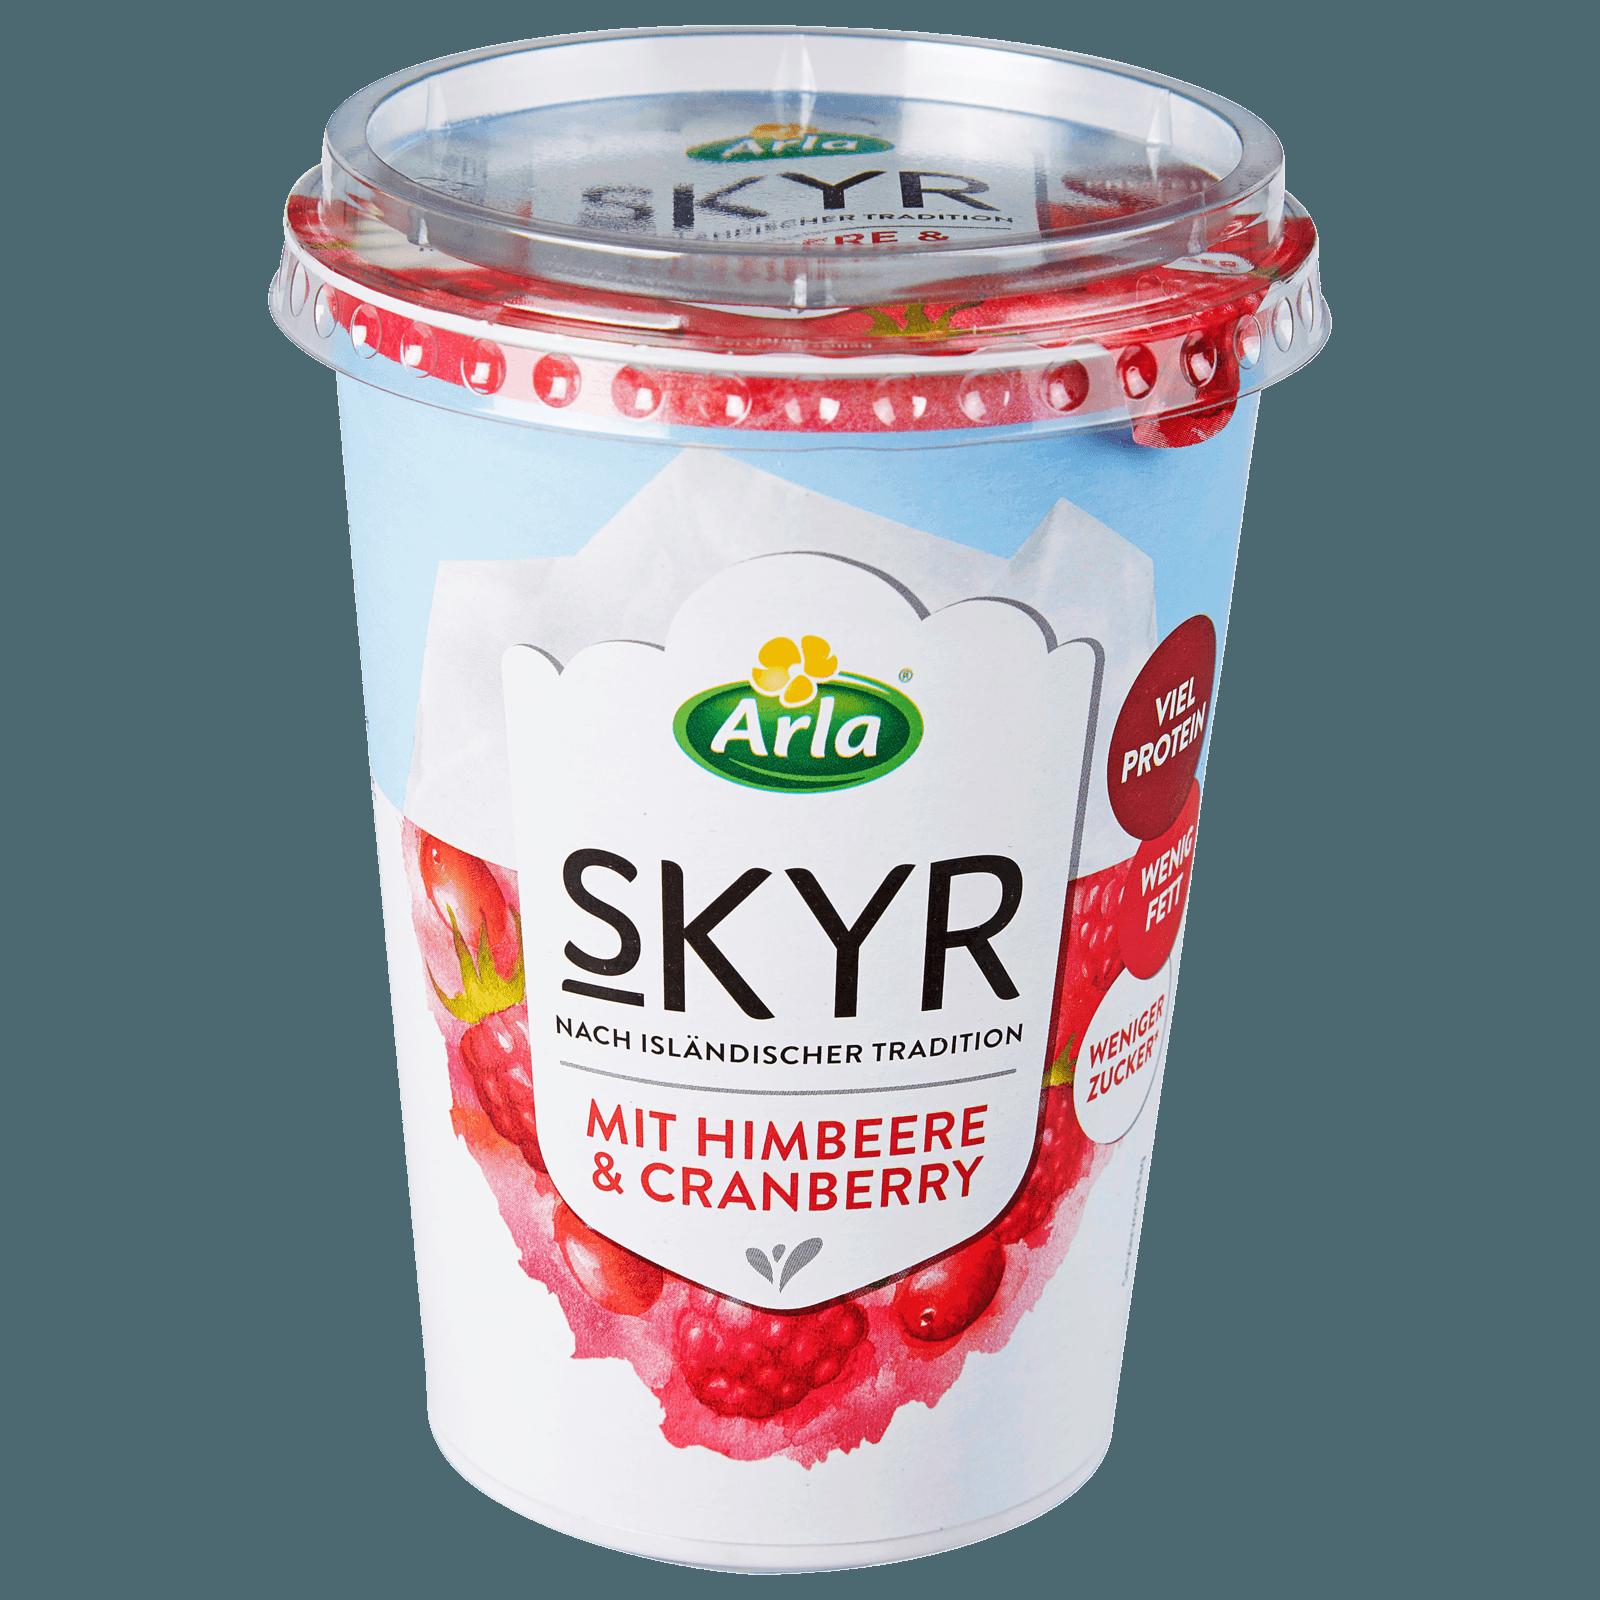 Arla Skyr Himbeere-Cranberry 450g